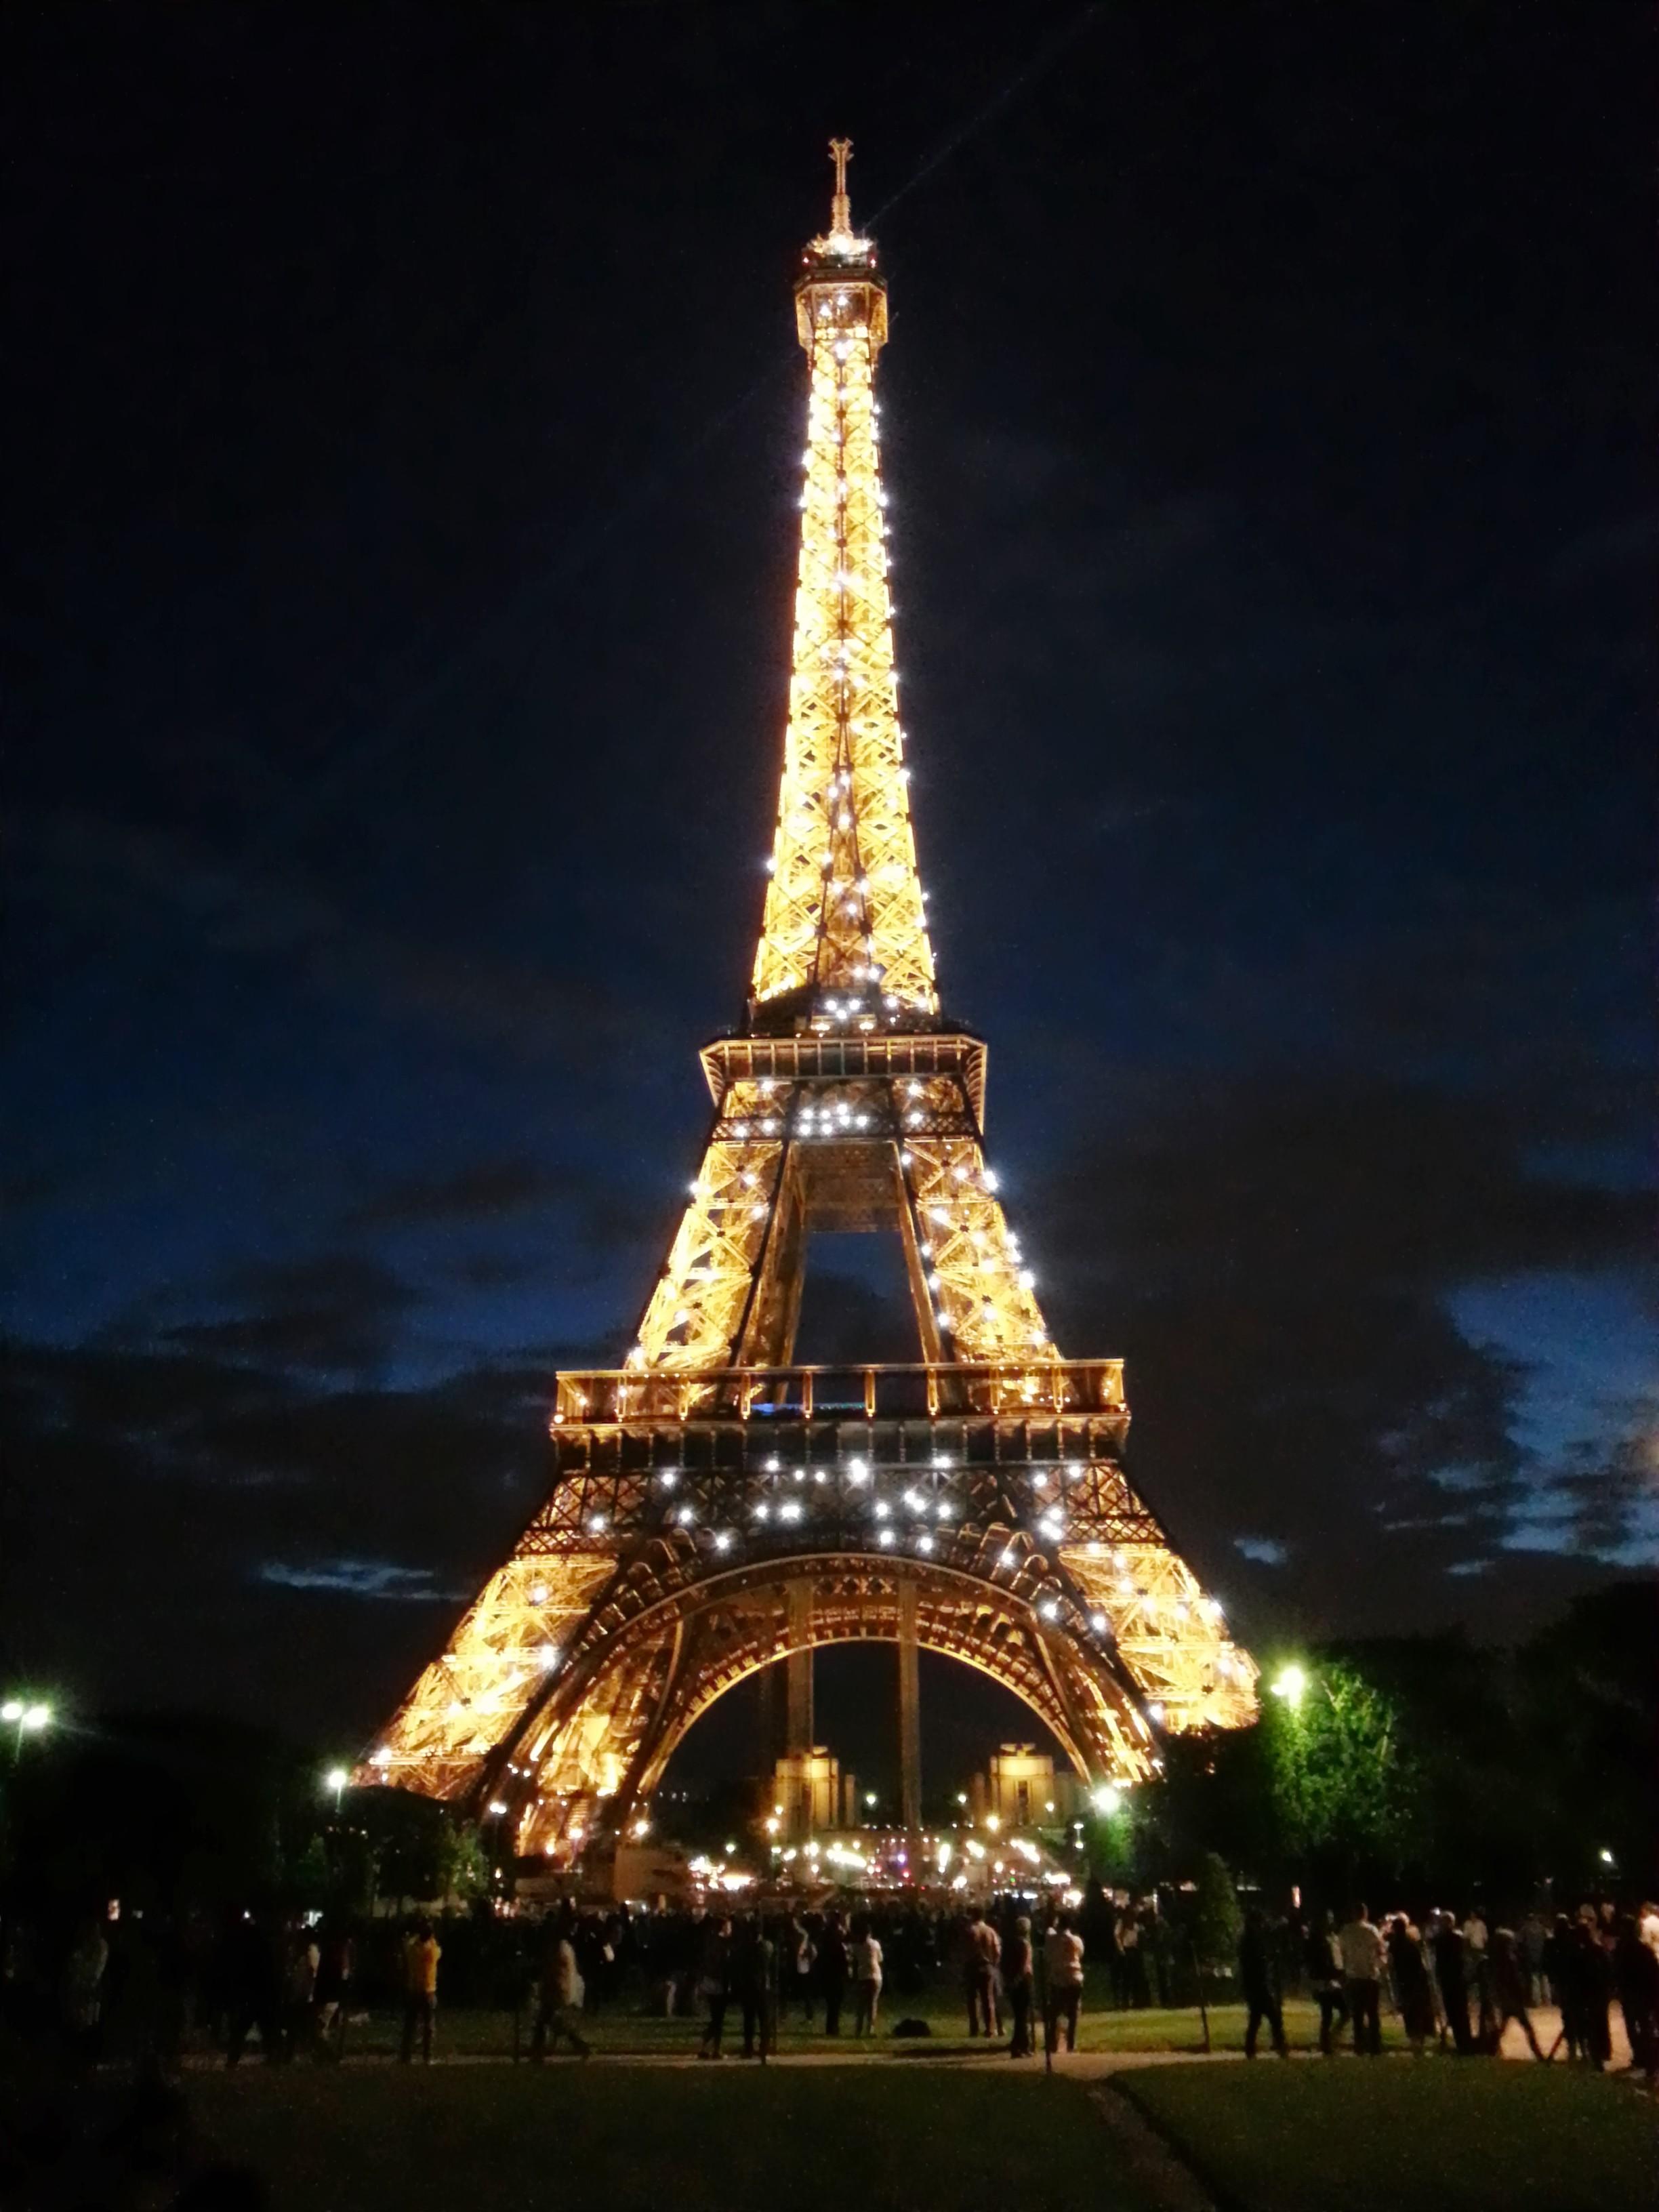 Fireworks Live Wallpaper Iphone Eiffel Tower Wallpapers At Night Pixelstalk Net